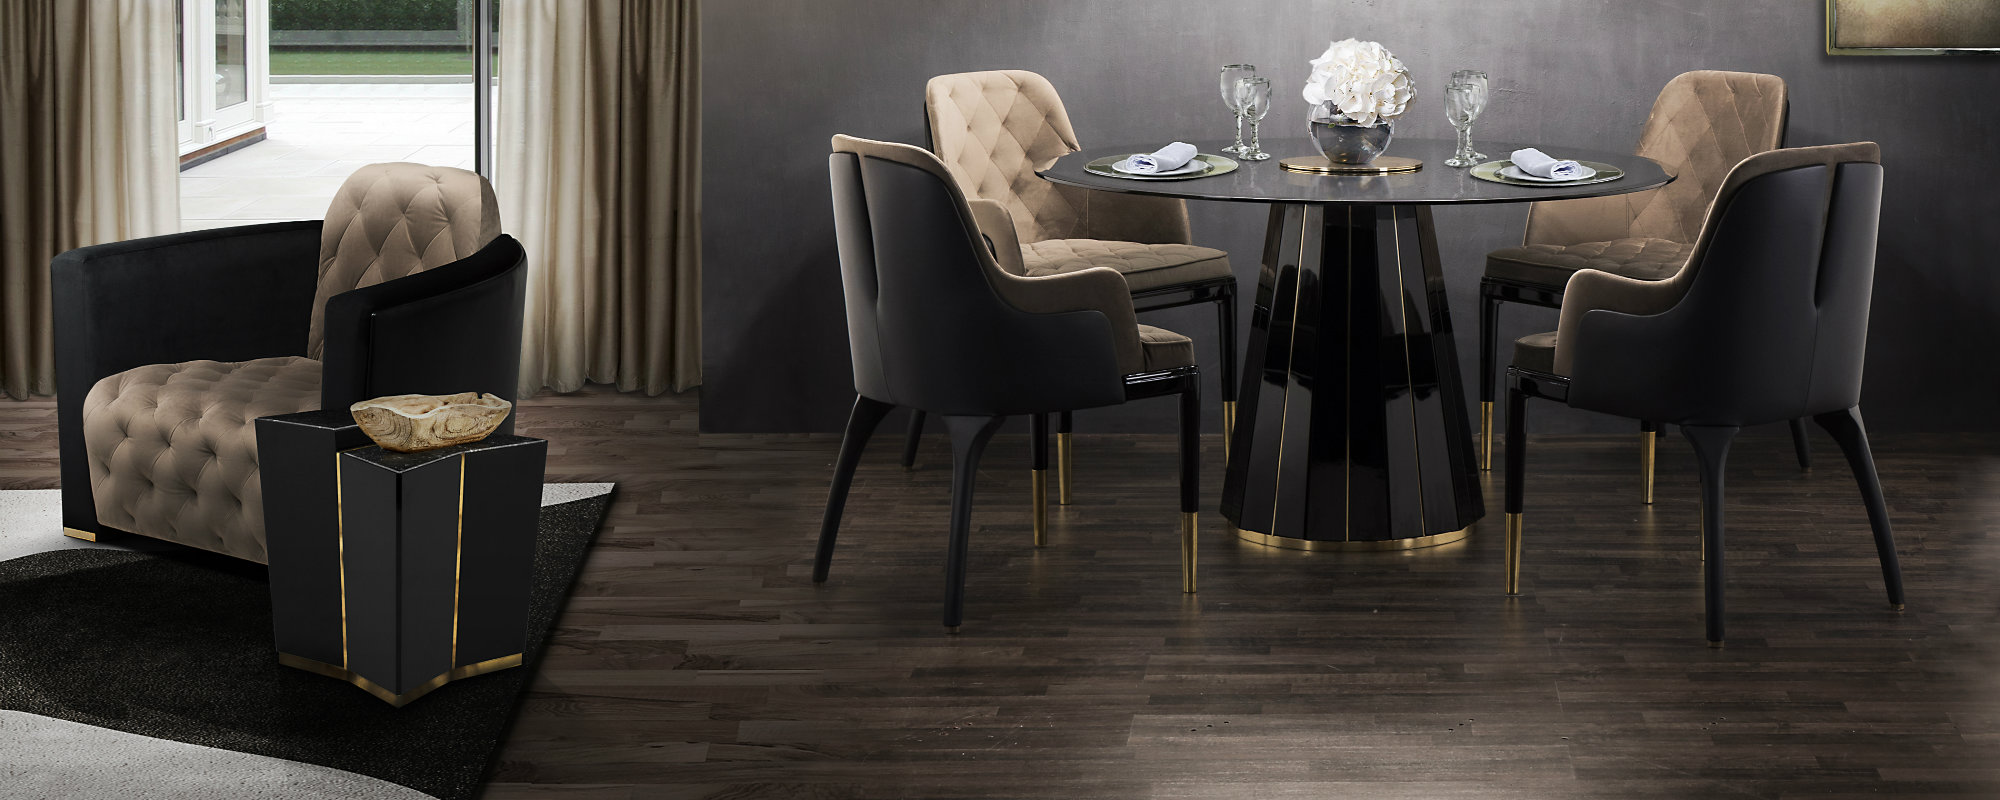 Sillas para comedores: Ideas lujuosas para proyectos fantasticos sillas para comedores Sillas para comedores: Ideas lujuosas para proyectos fantasticos Featured 8